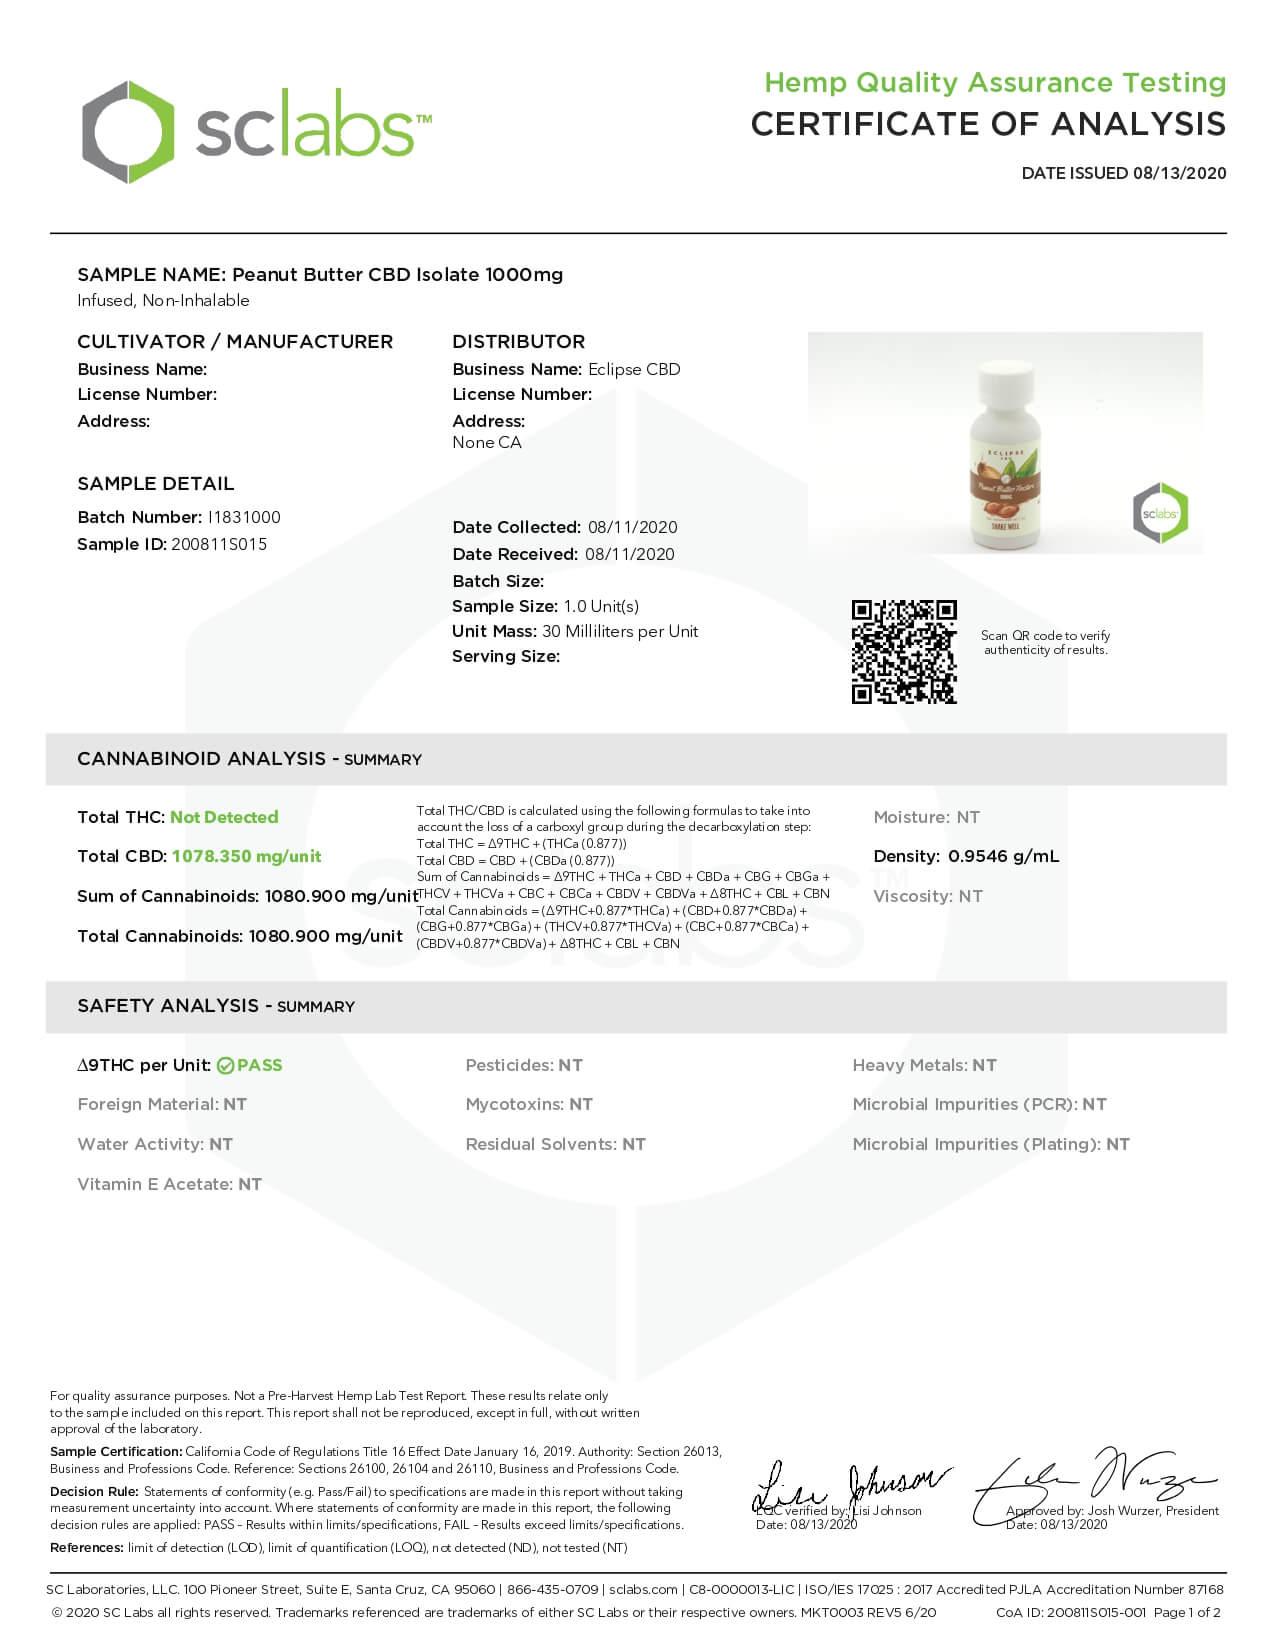 Eclipse CBD MCT Tincture Peanut Butter 1000mg Lab Report